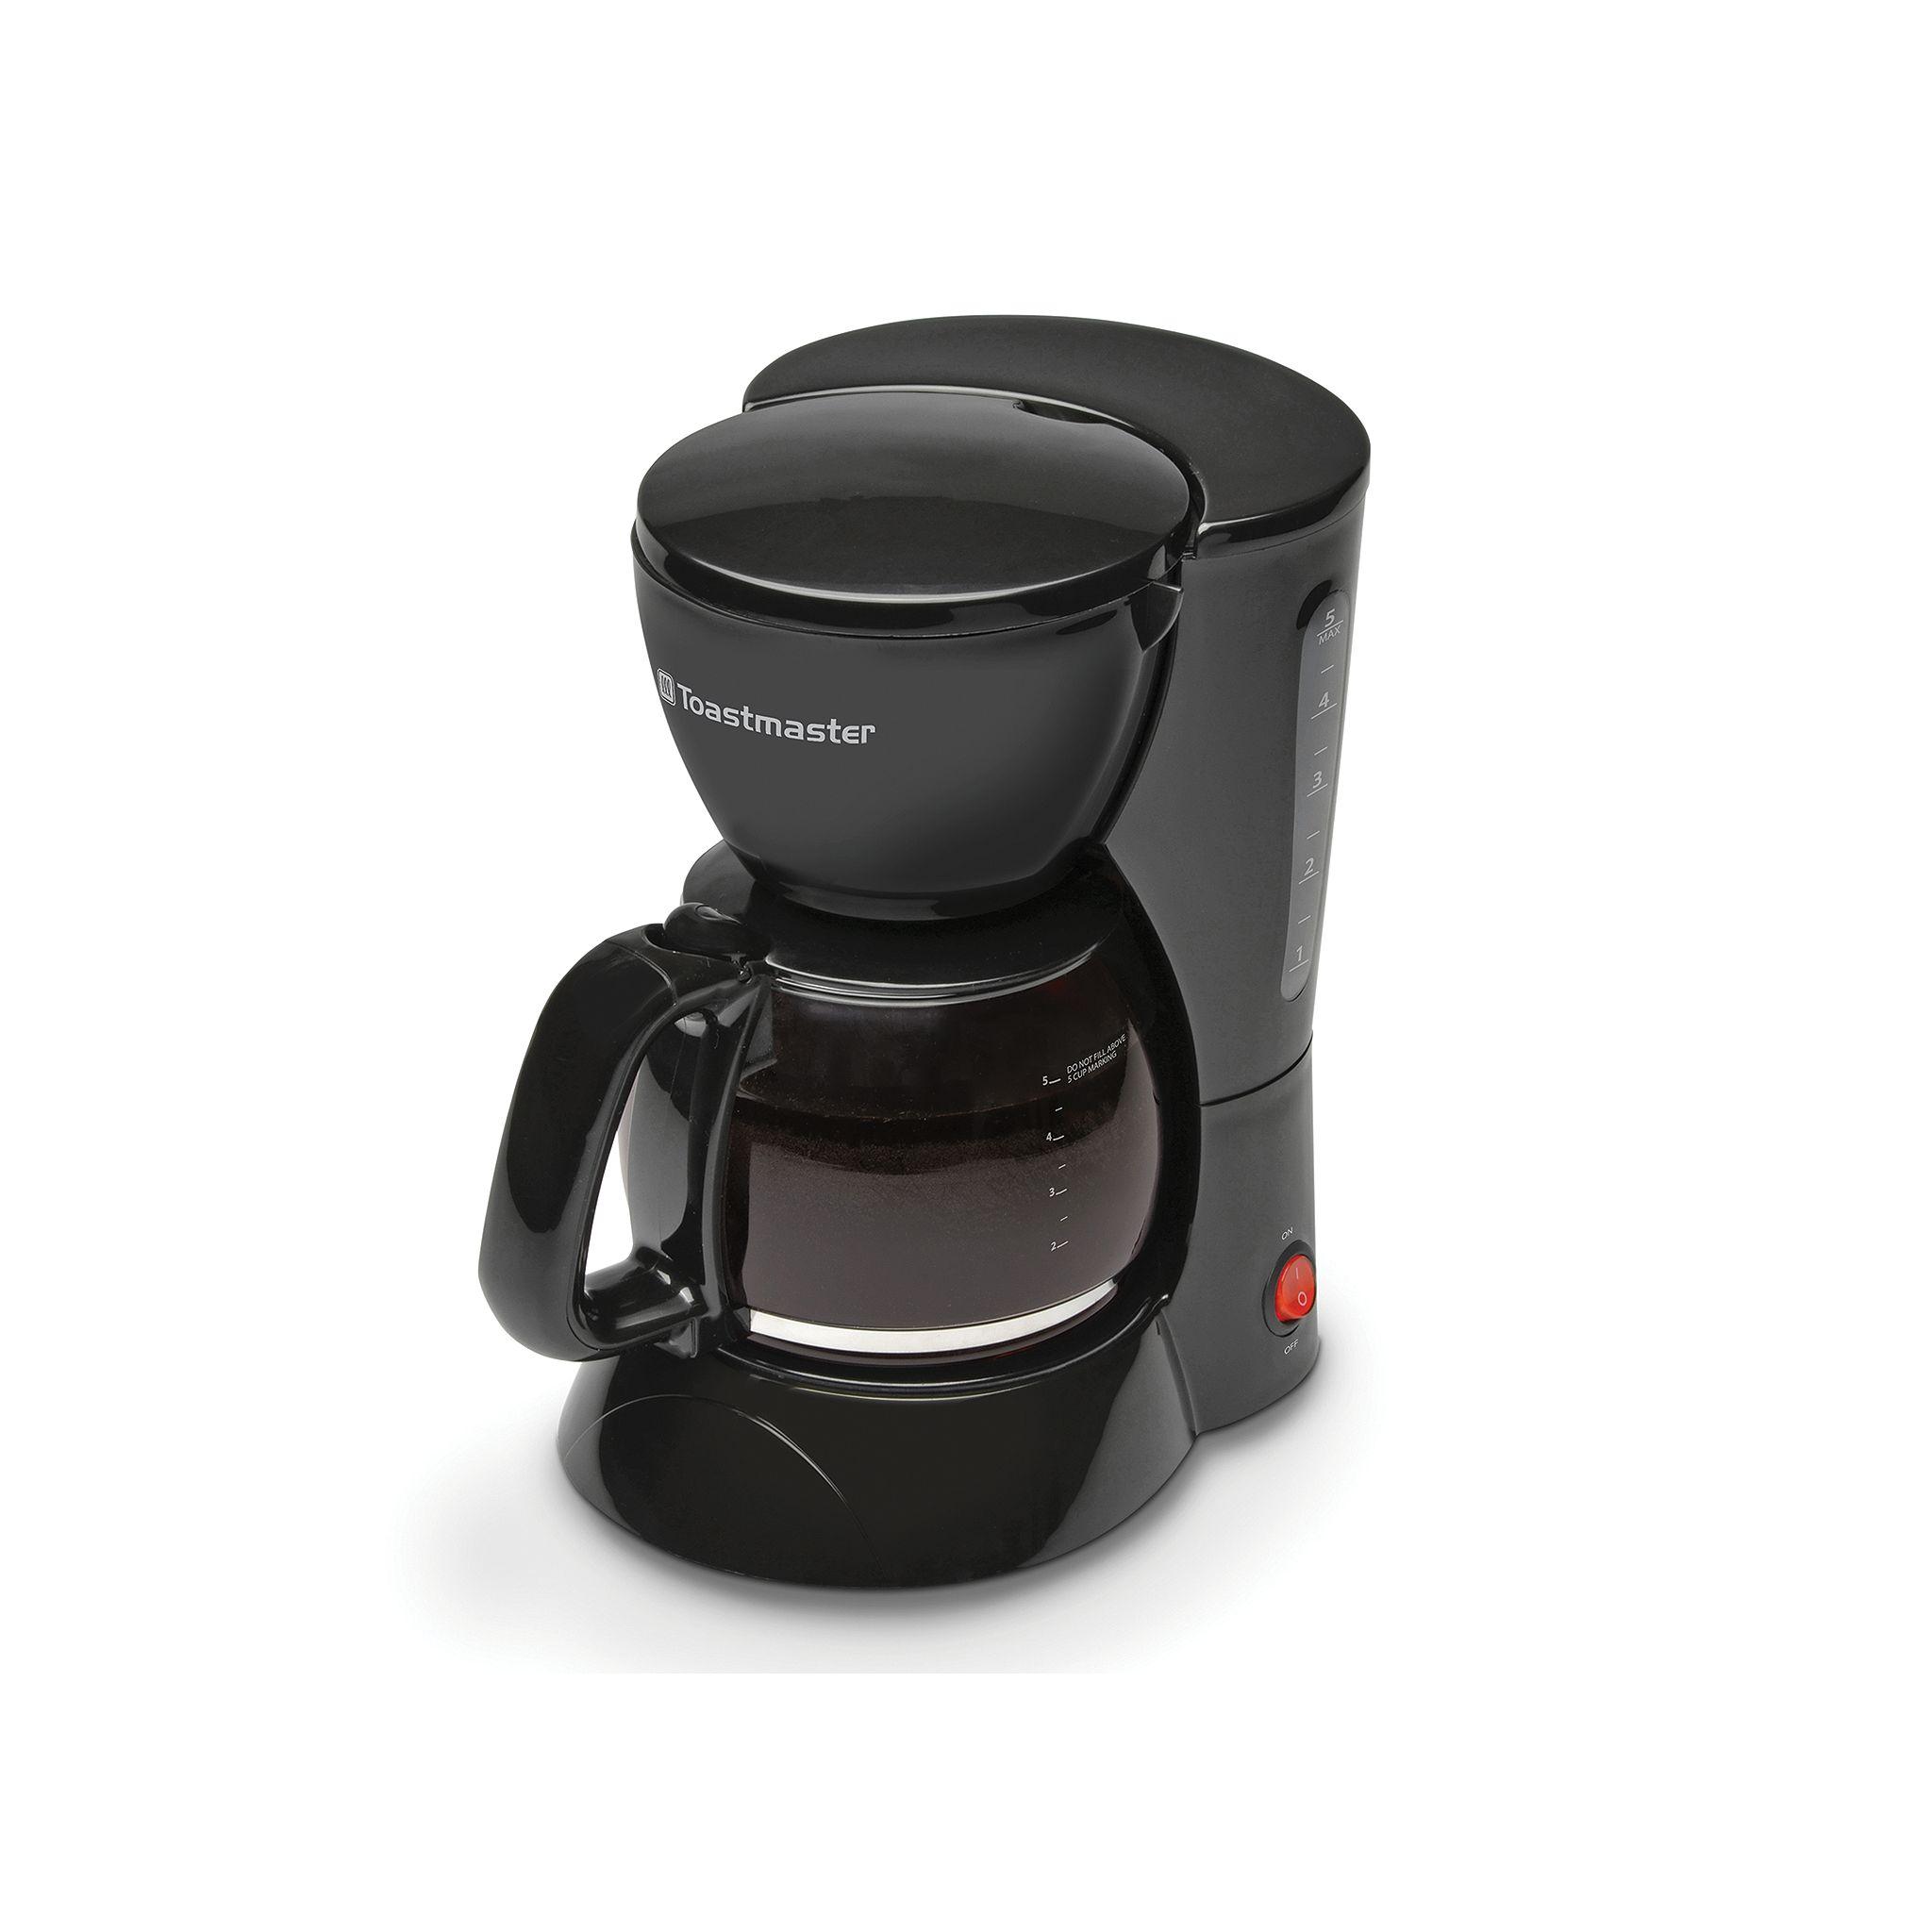 Toastmaster Small Appliance on Sale